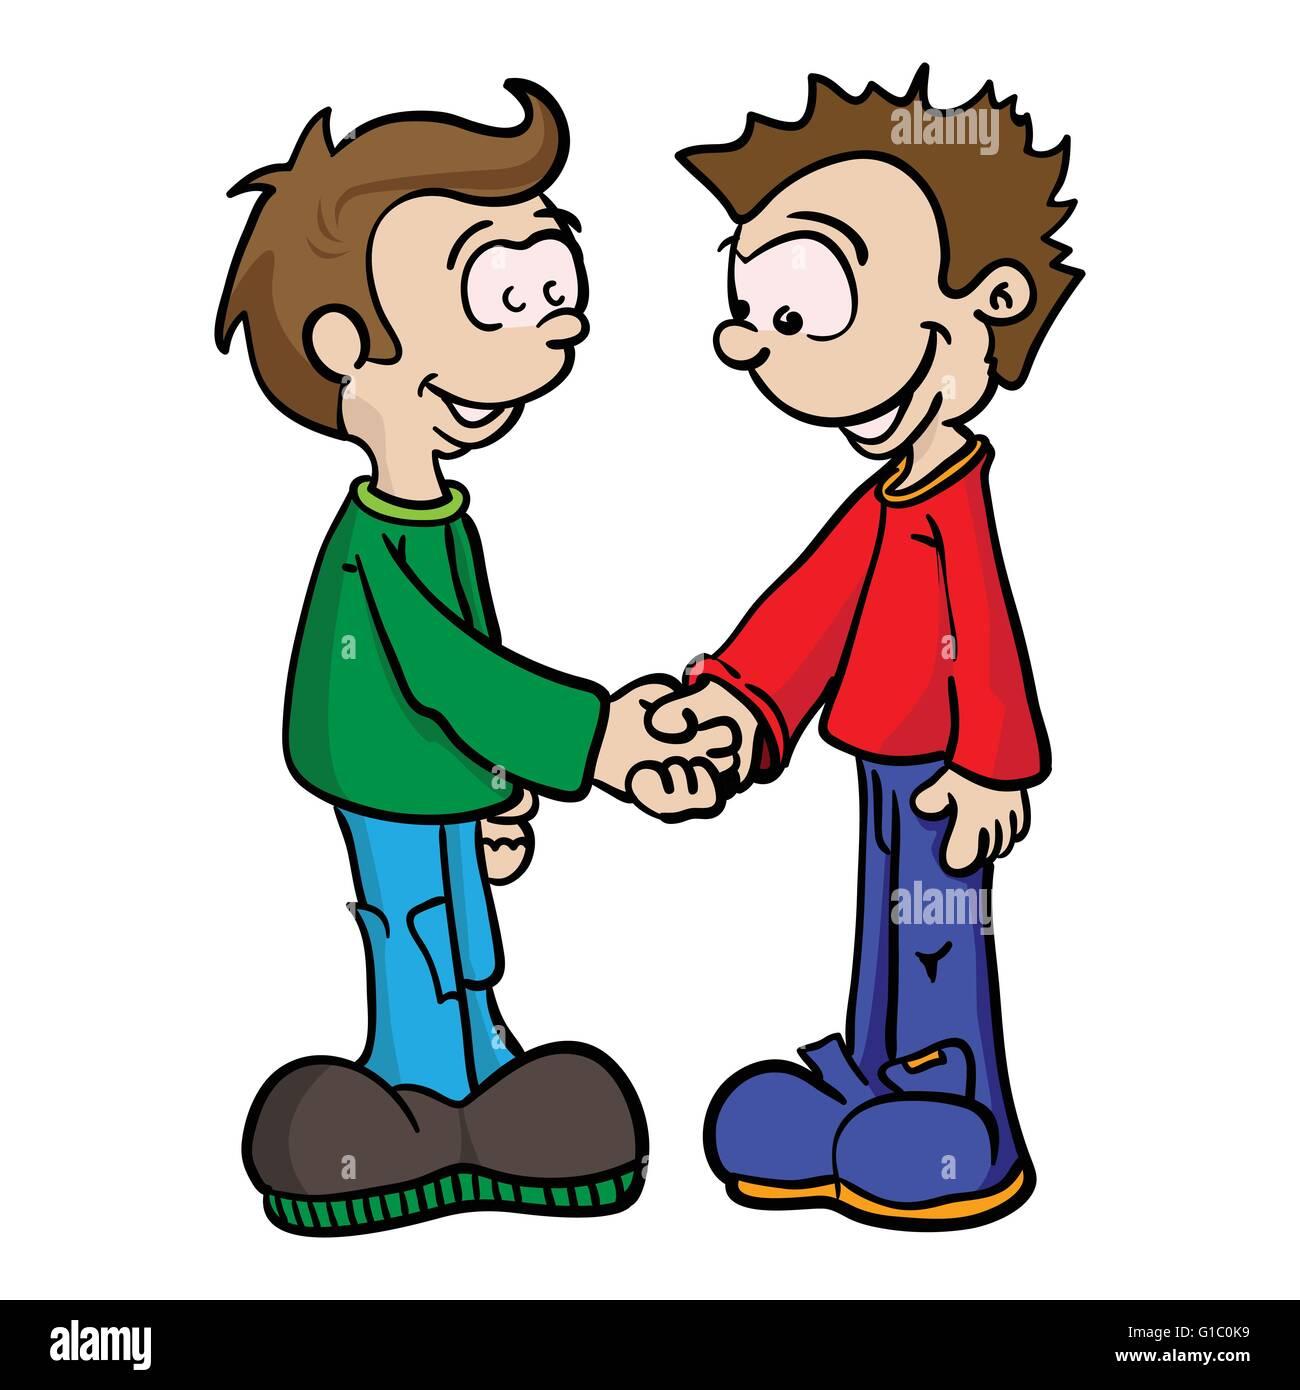 cartoon illustration of two boys shaking hands stock vector art rh alamy com shake hands cartoon shaking hands cartoon pic